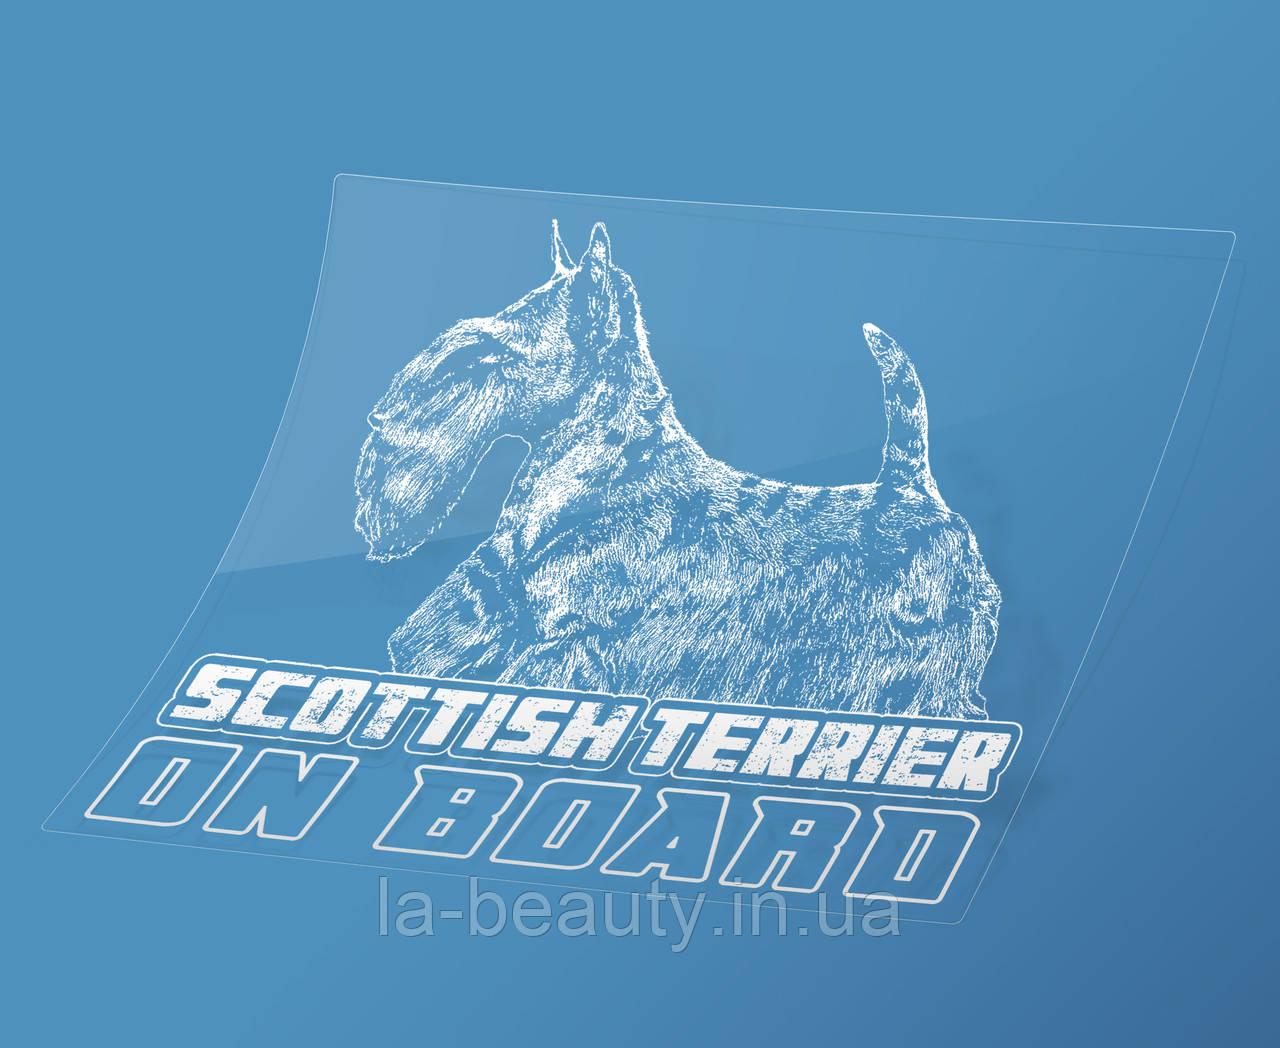 Наклейка на машину/авто Шотландский терьер / скотчтерьер на борту (Scottish terrier on Board)